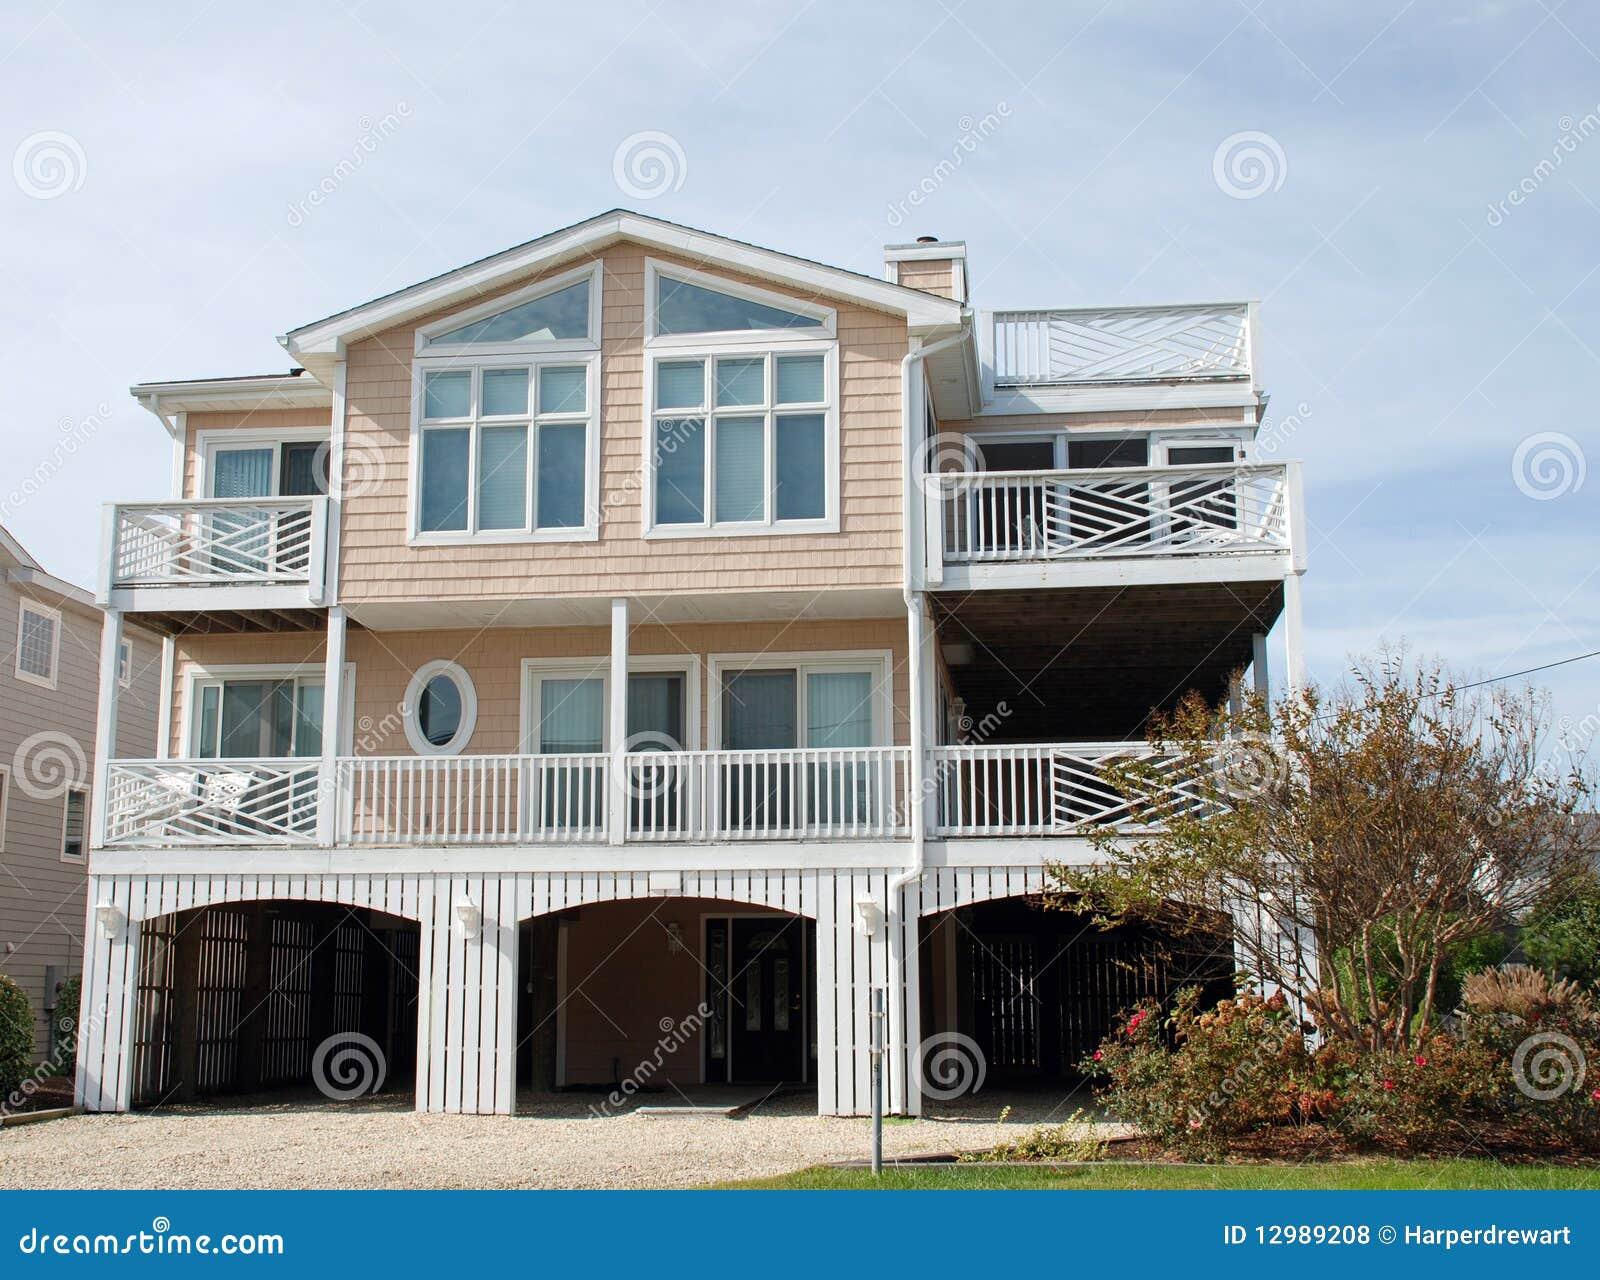 Coastal Luxury Home 70 Royalty Free Stock Photos Image